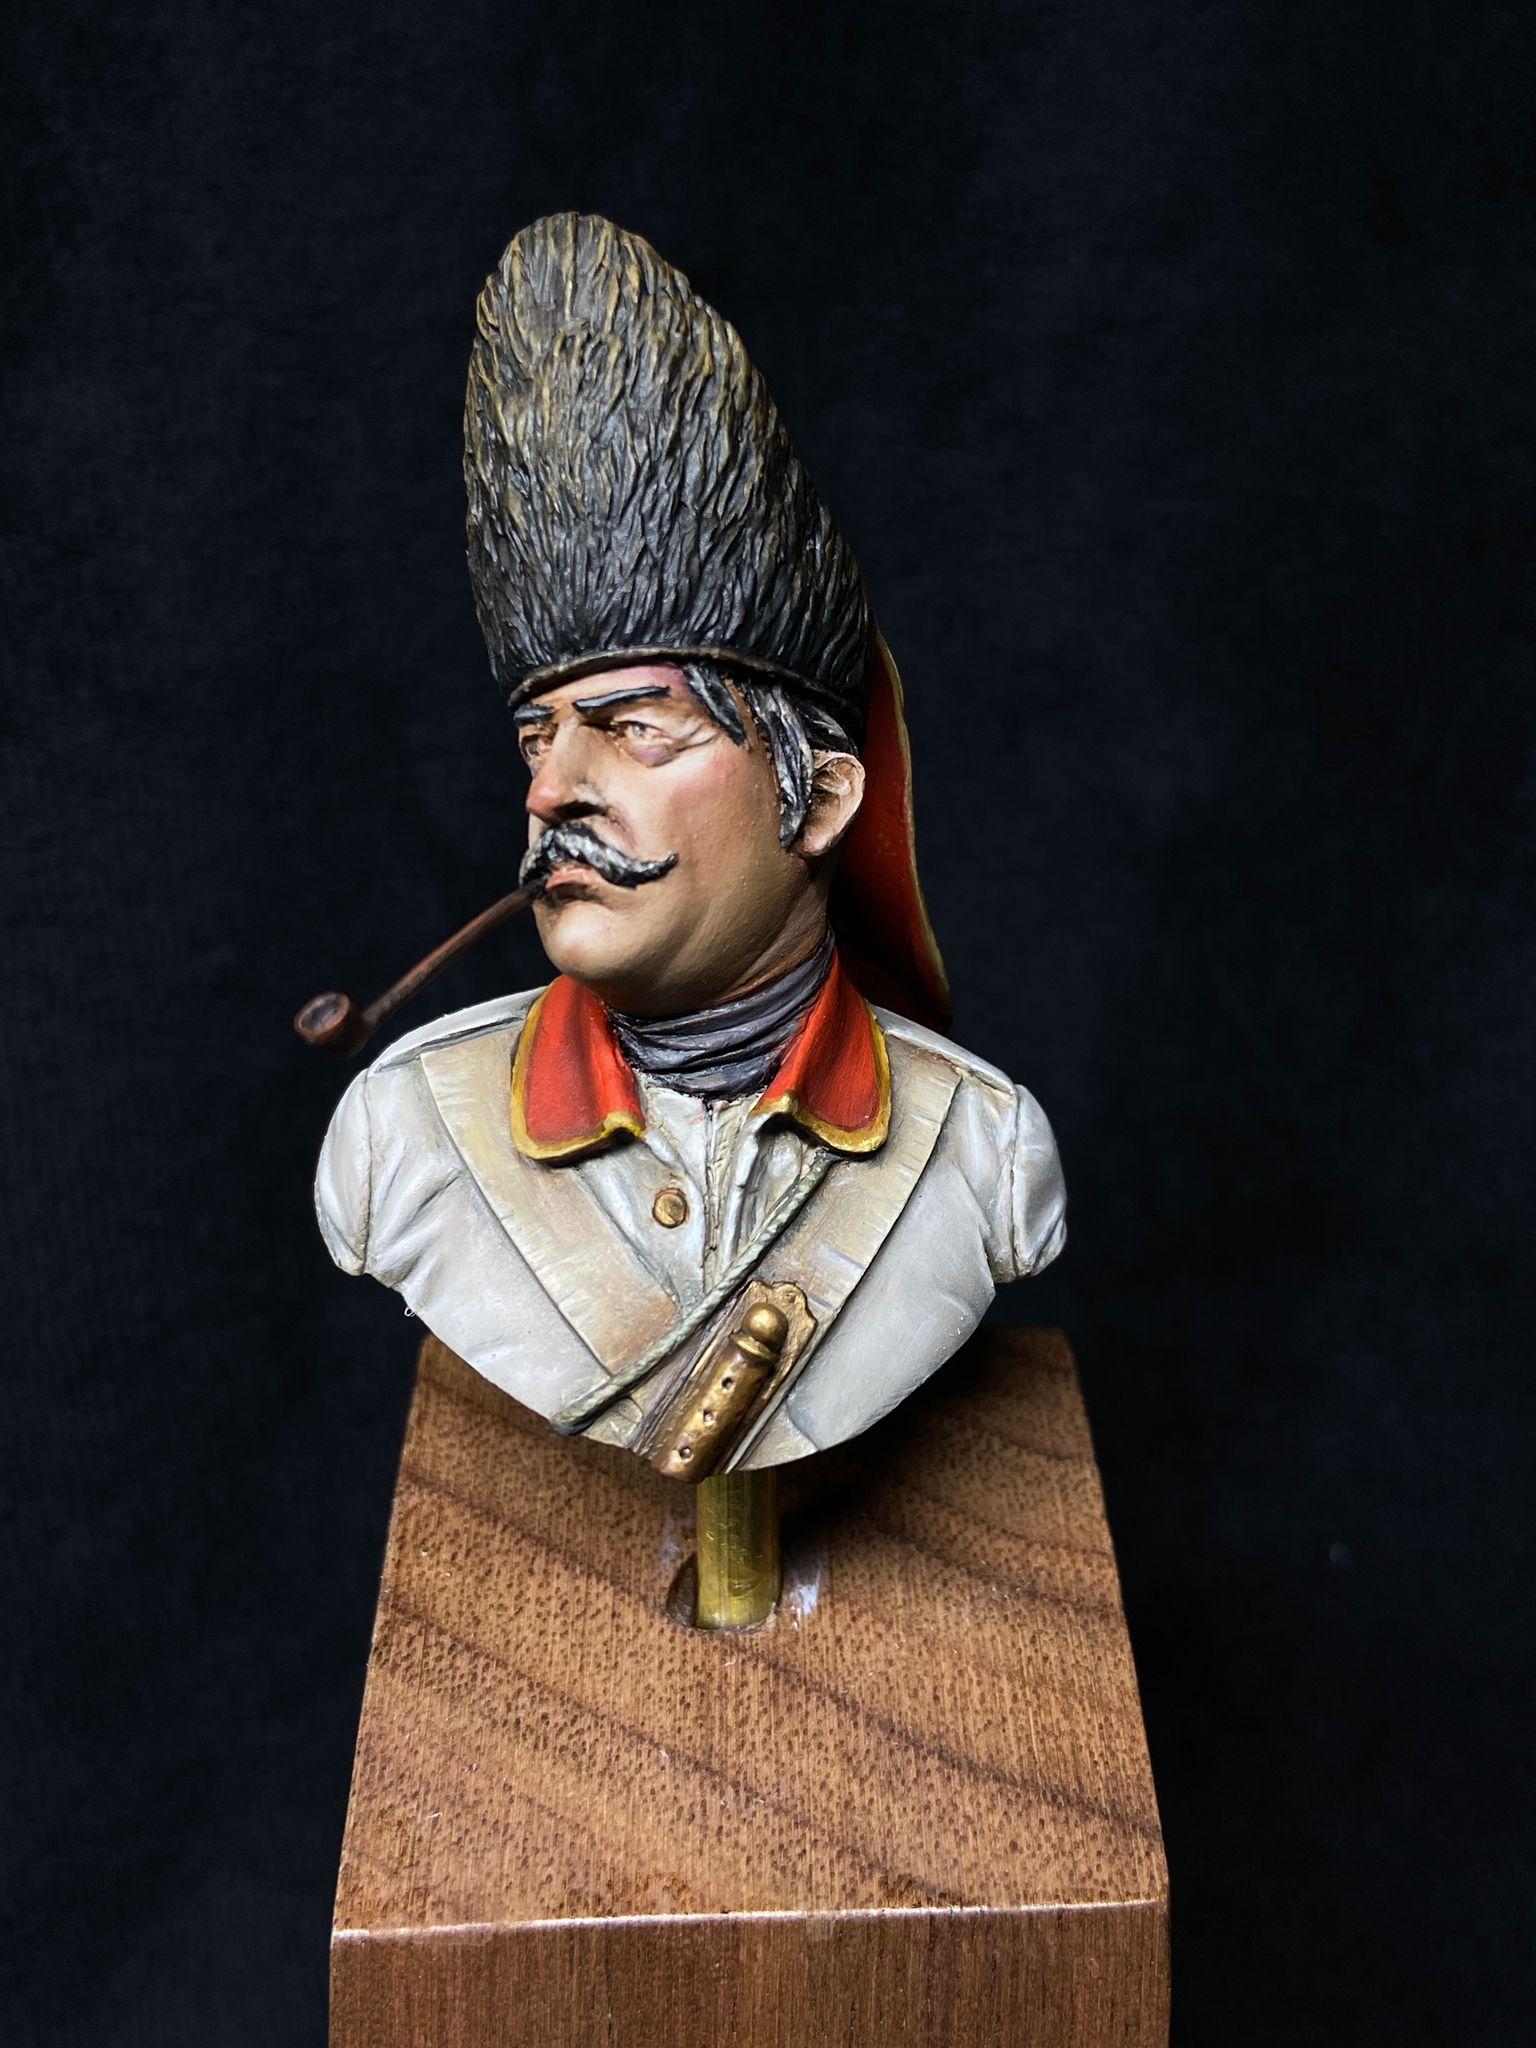 Granadero Regimiento Navarra. S. XVII